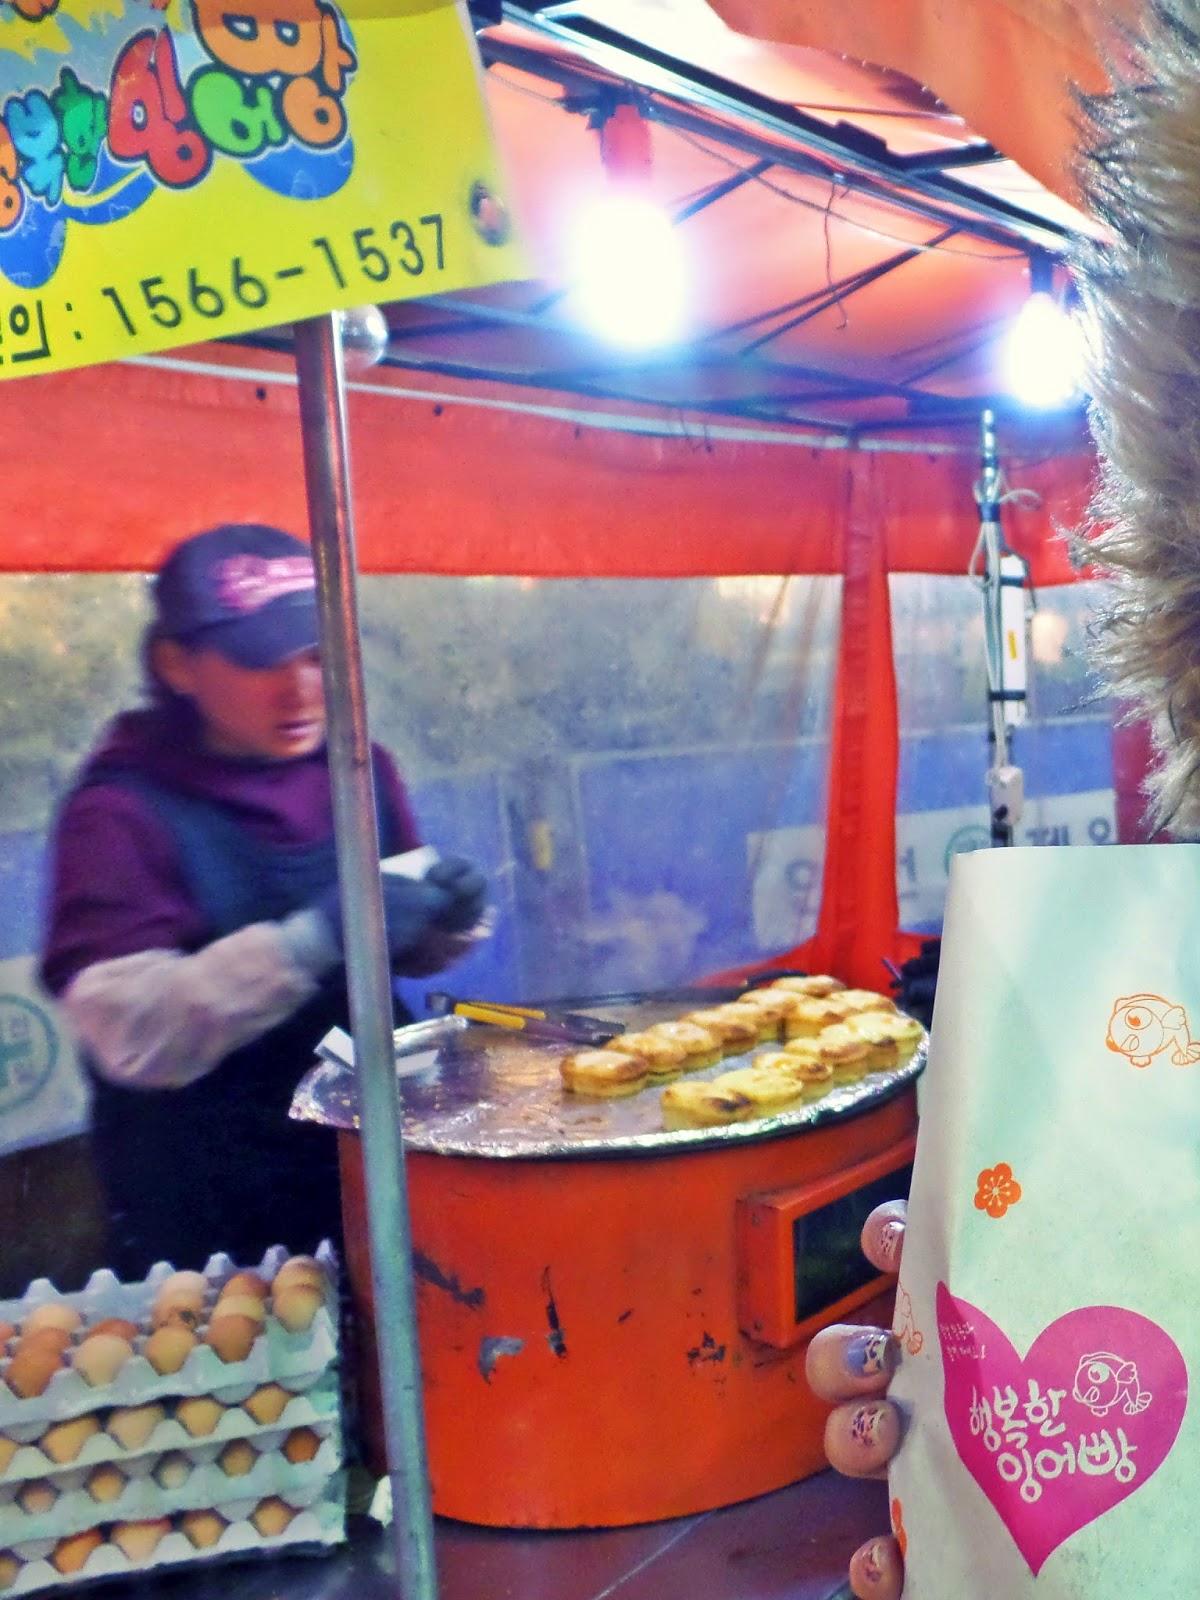 Sinchon Snack Street Food | meheartsoul.blogspot.com